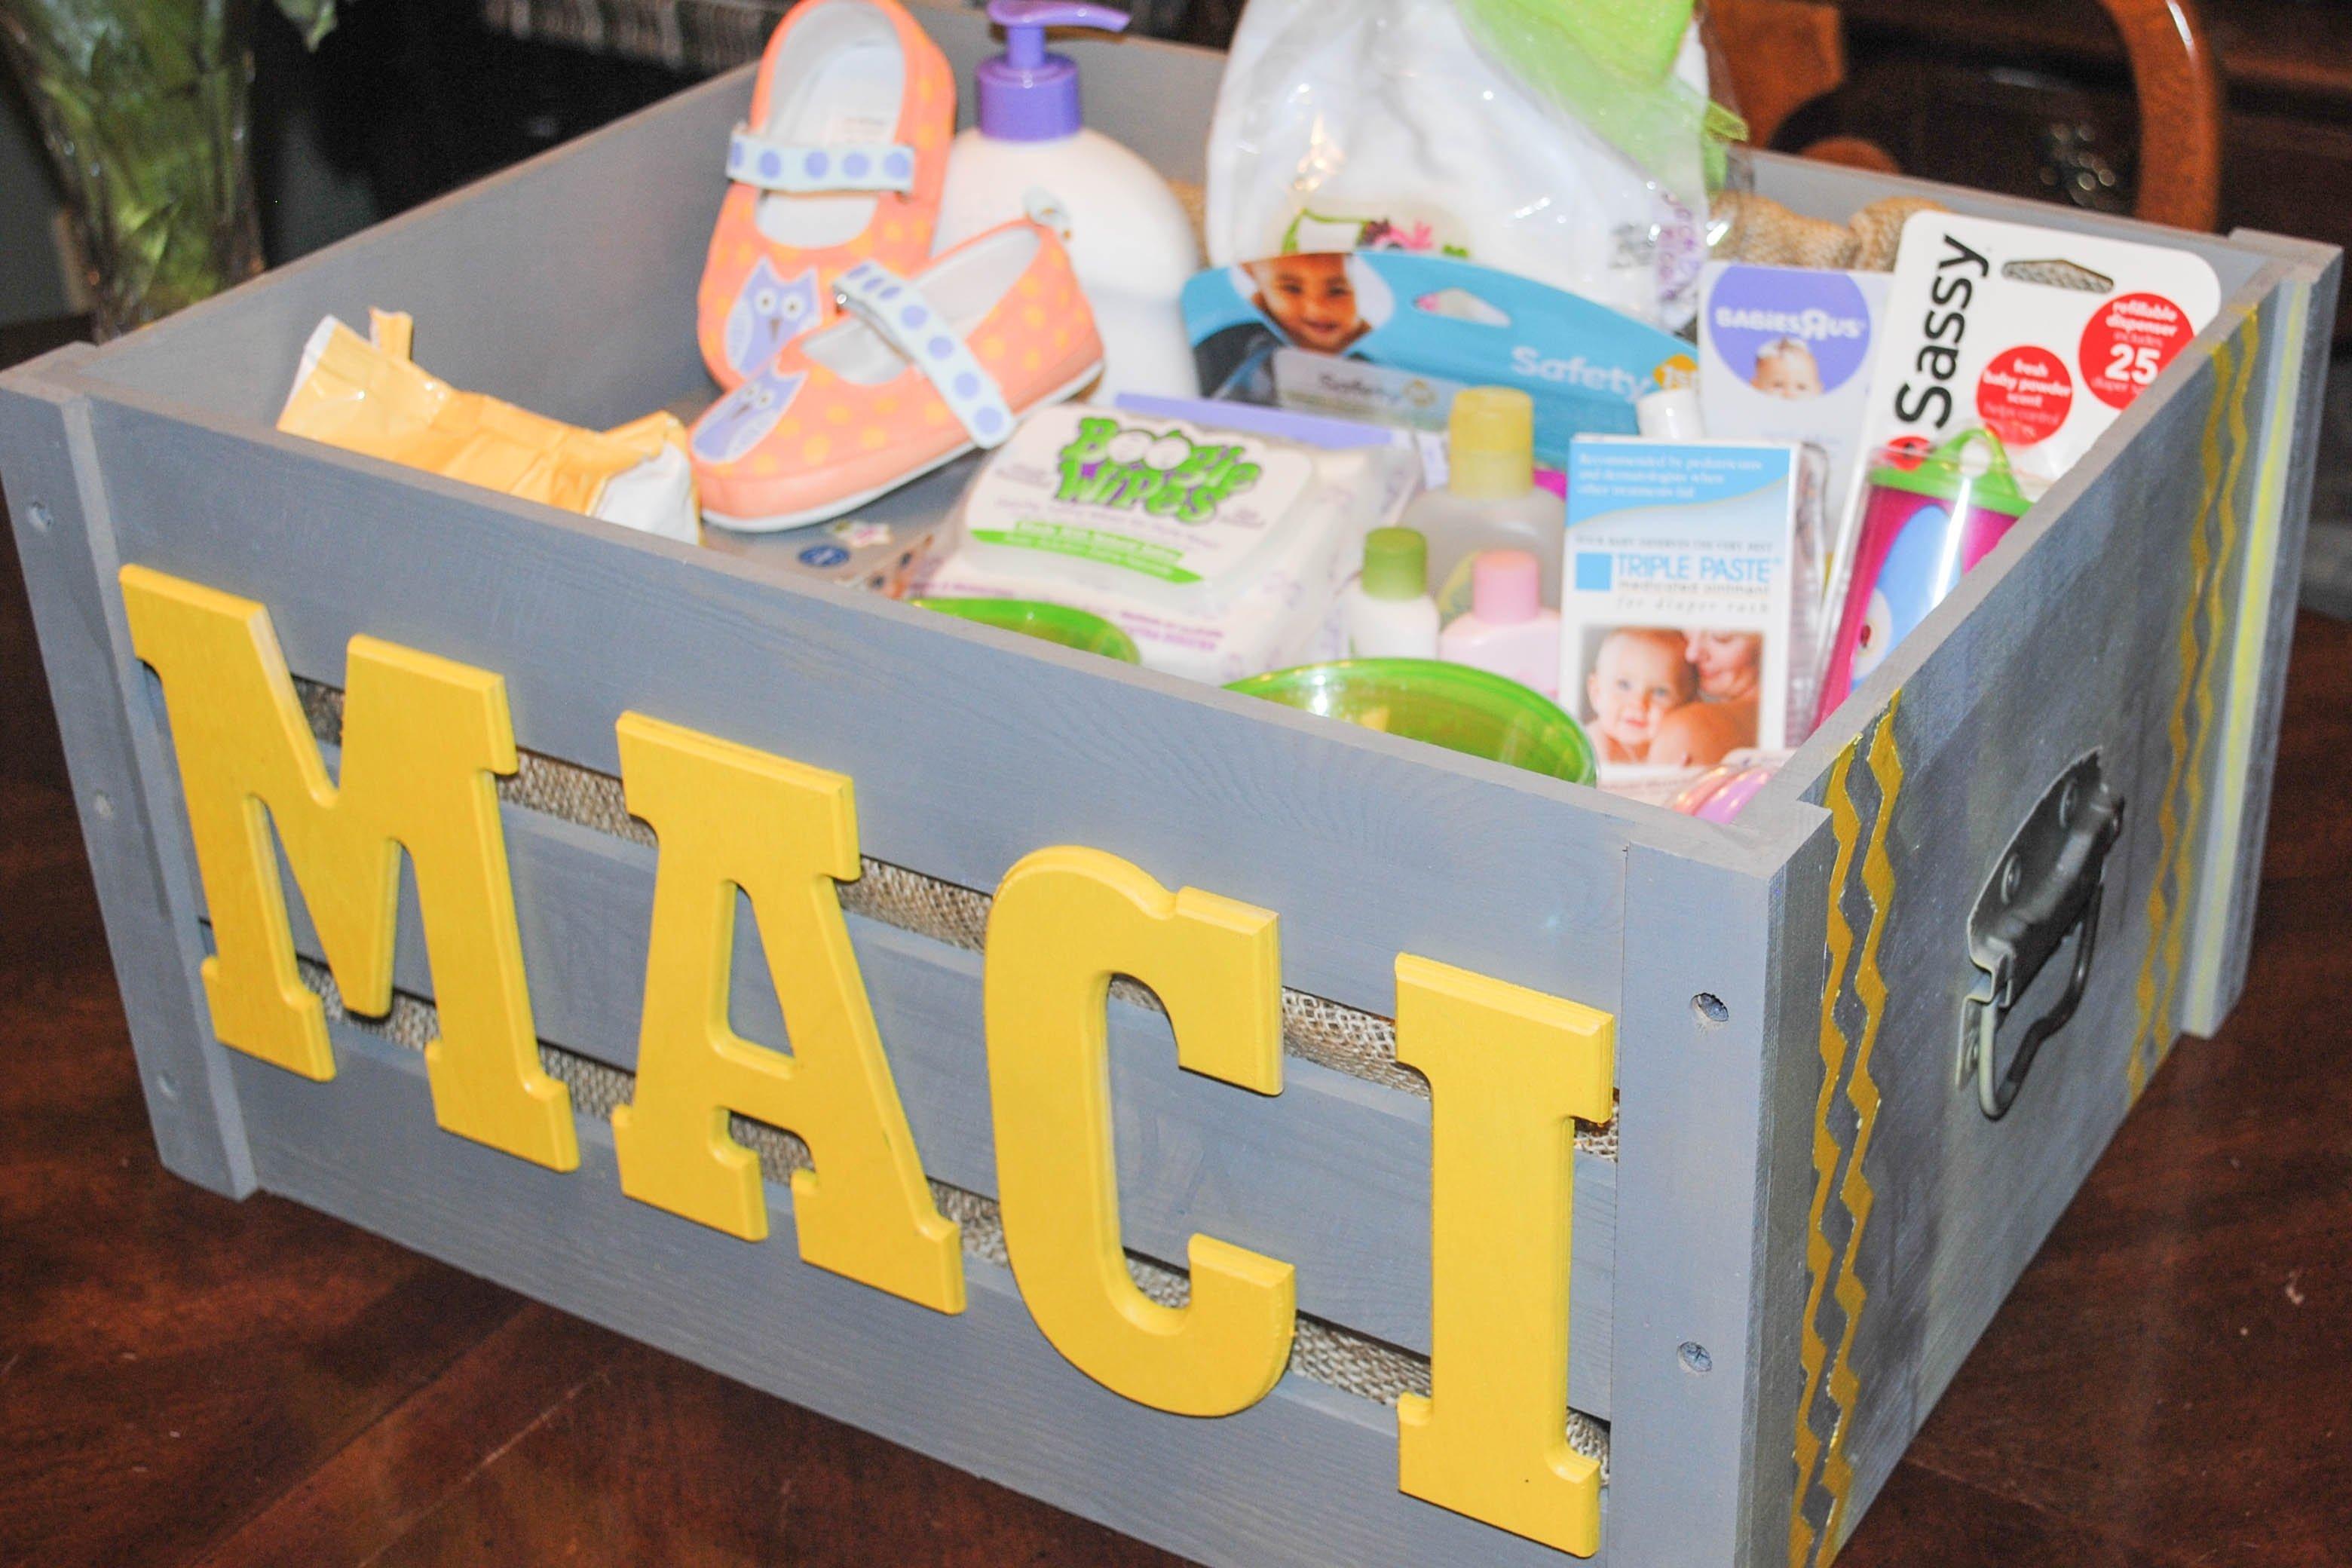 10 Stylish Martha Stewart Gift Basket Ideas photo baby shower gift baskets image